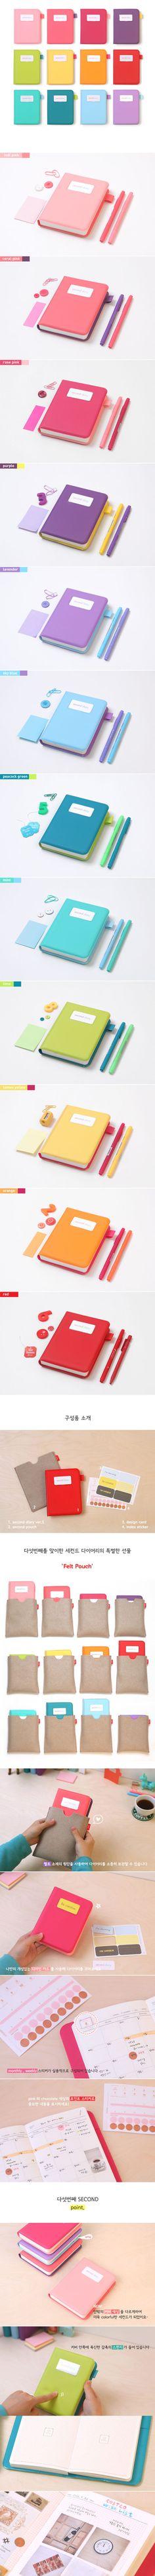 K-Styleme Planner / Journal | Cool Office Supplies, Fun Desk Accessories, Desk Toys, cute planner, cute dairy, cute journal